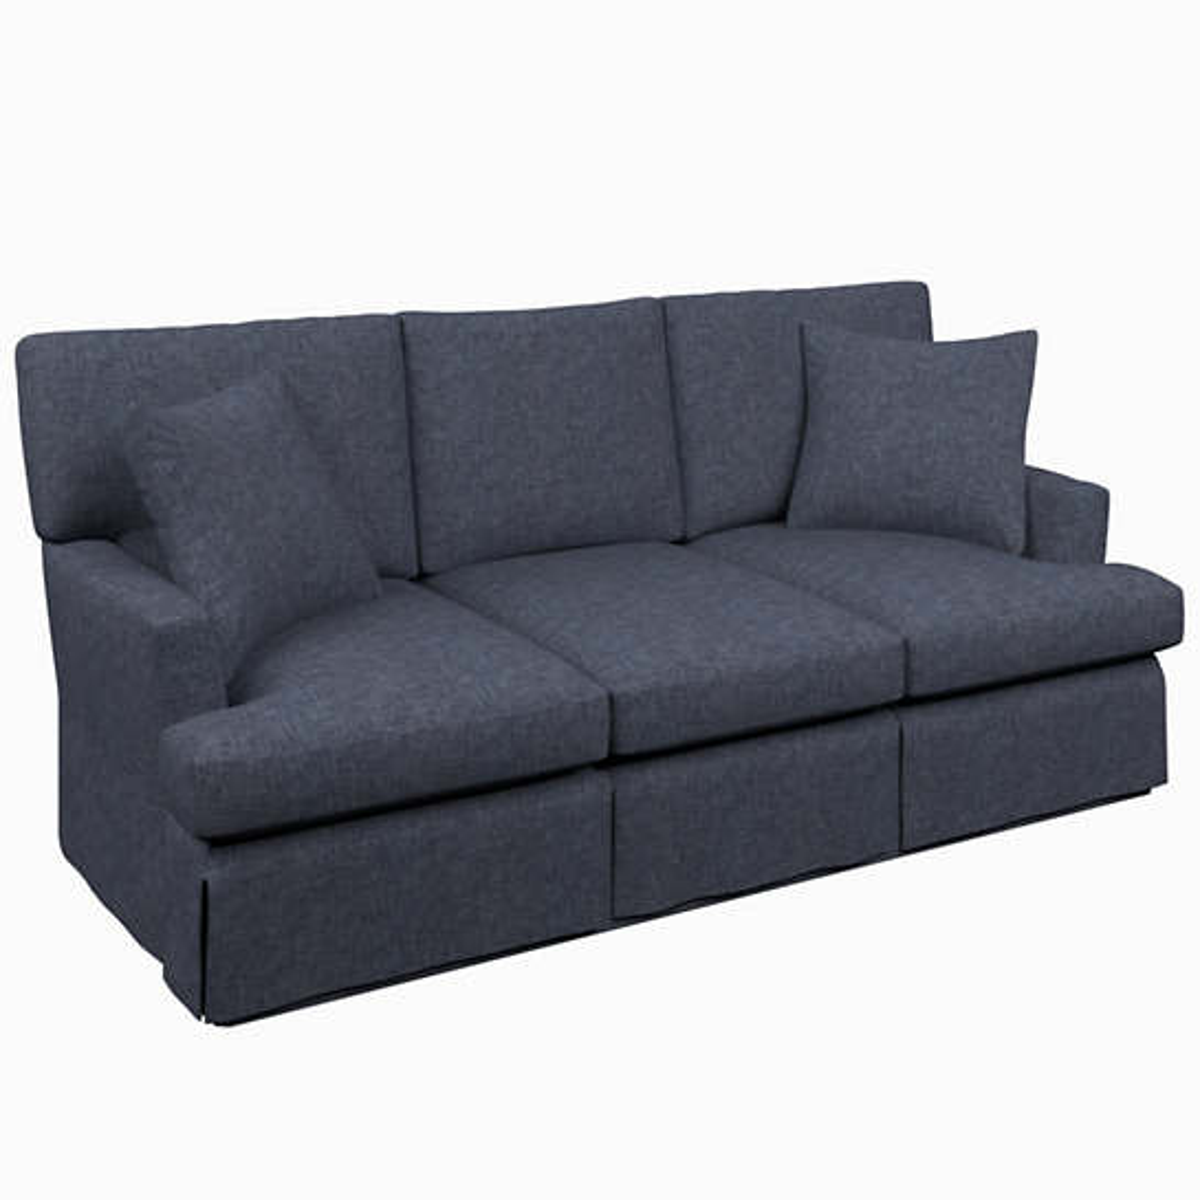 Greylock Navy Saybrook 3 Seater Upholstered Sofa